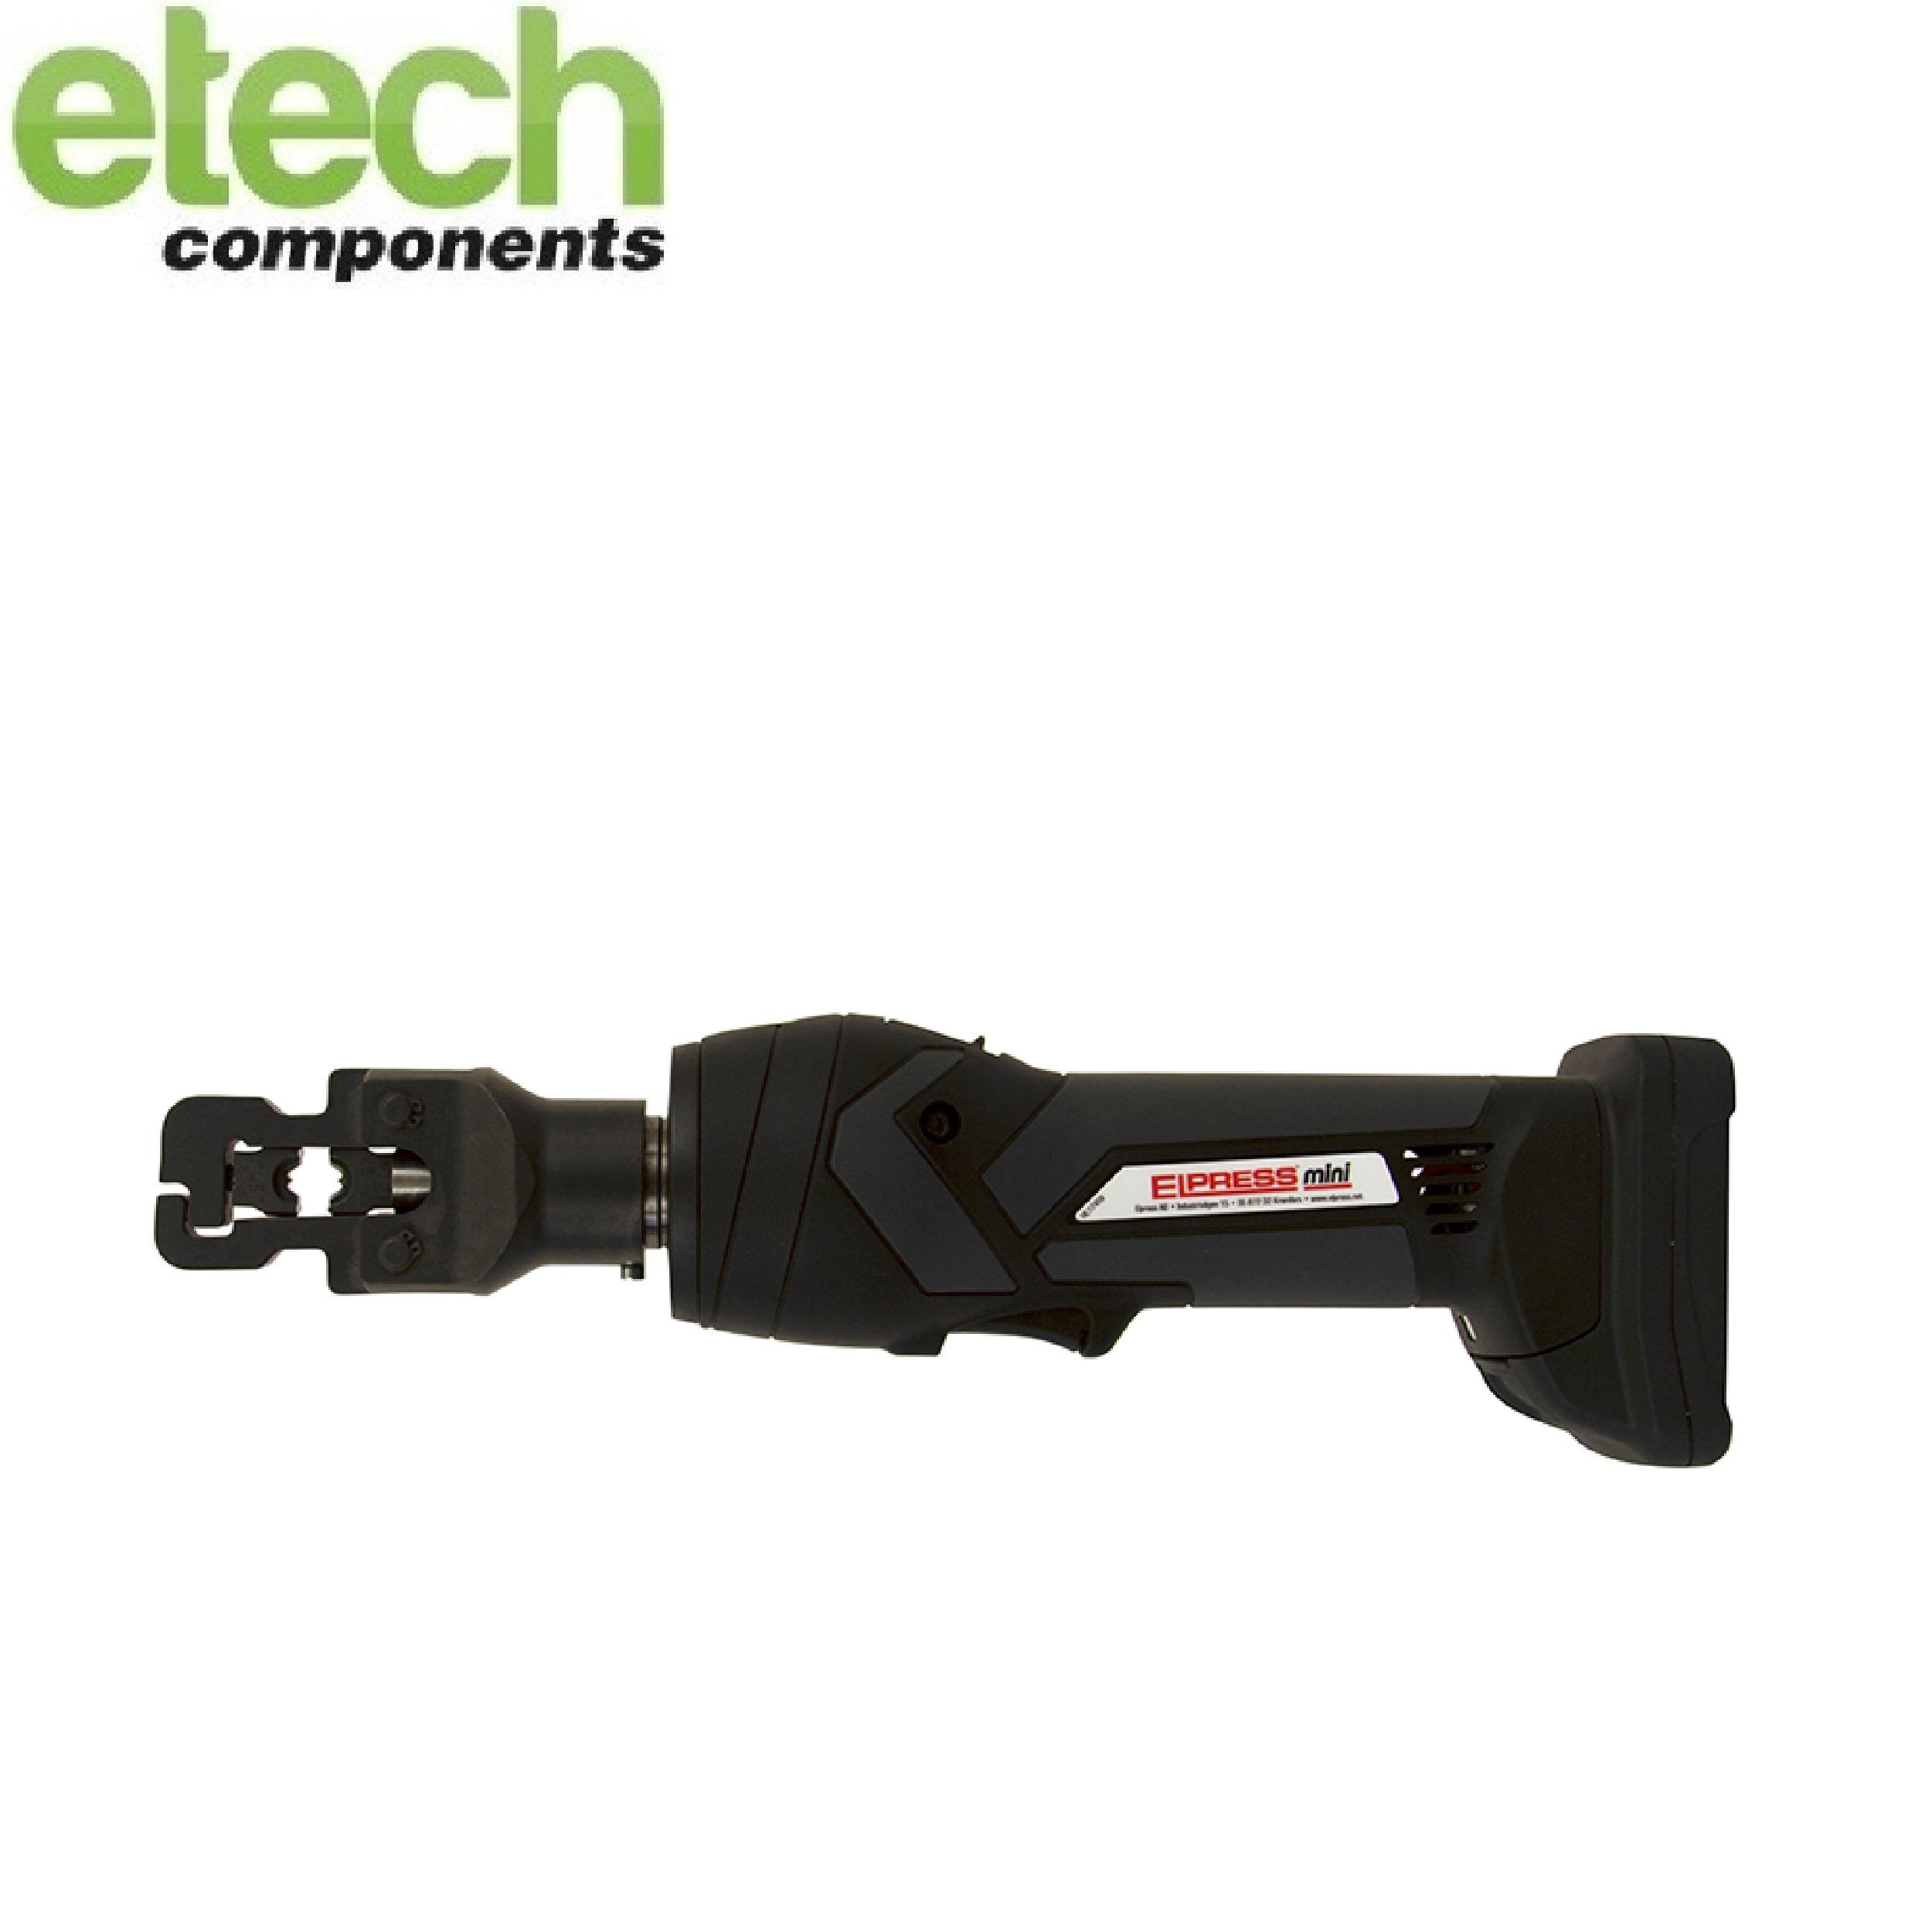 Elpress Mini PVL130L Electro Hydraulic Crimping Tool